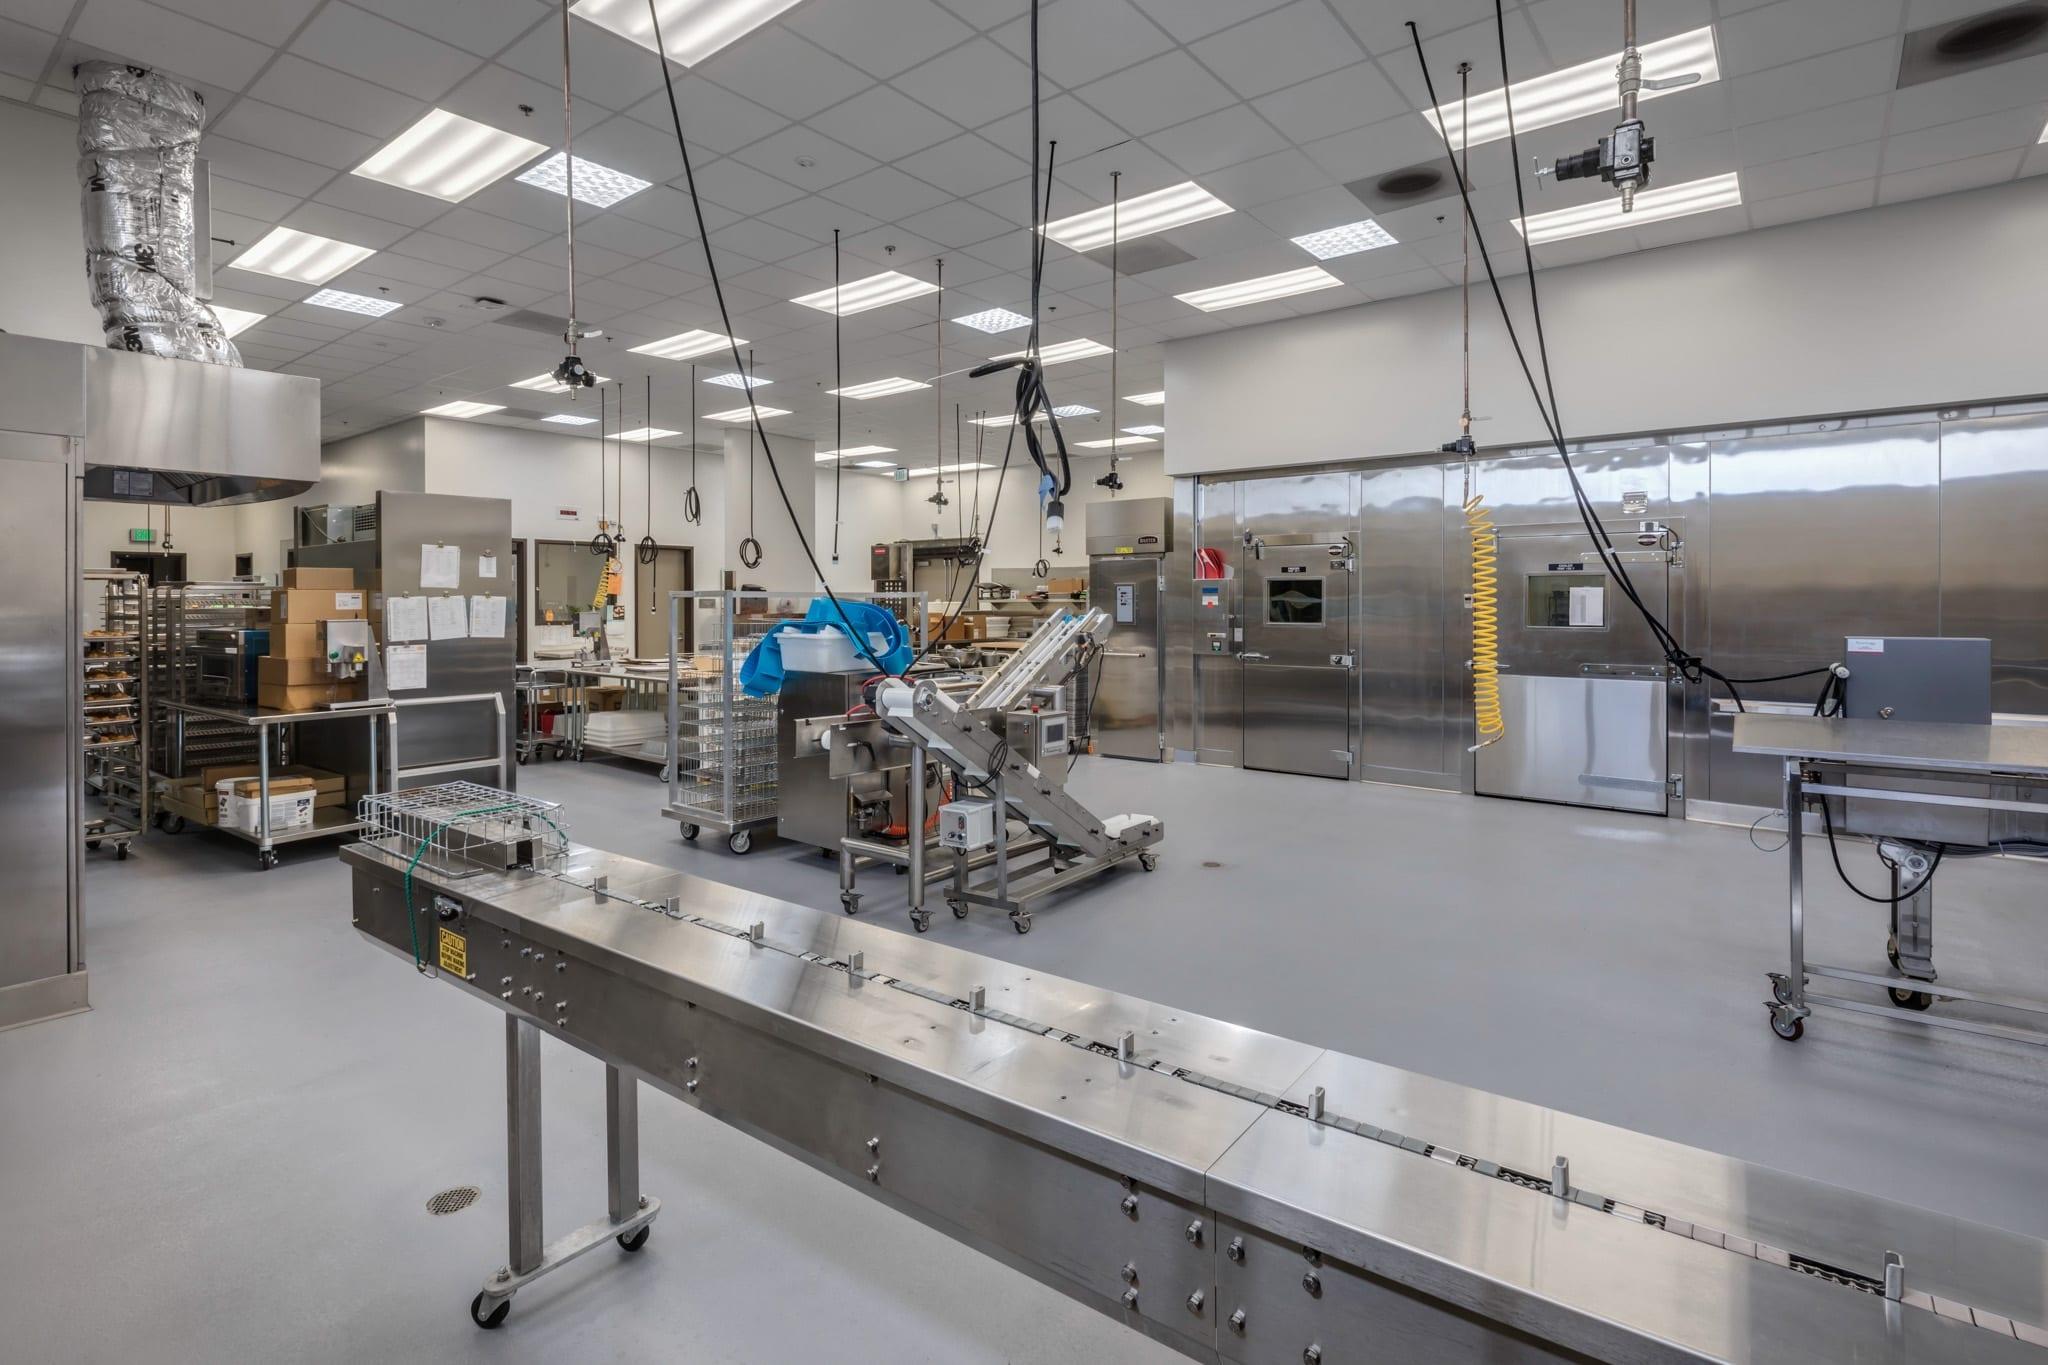 Central Kitchen—Irvine Unified School District-09